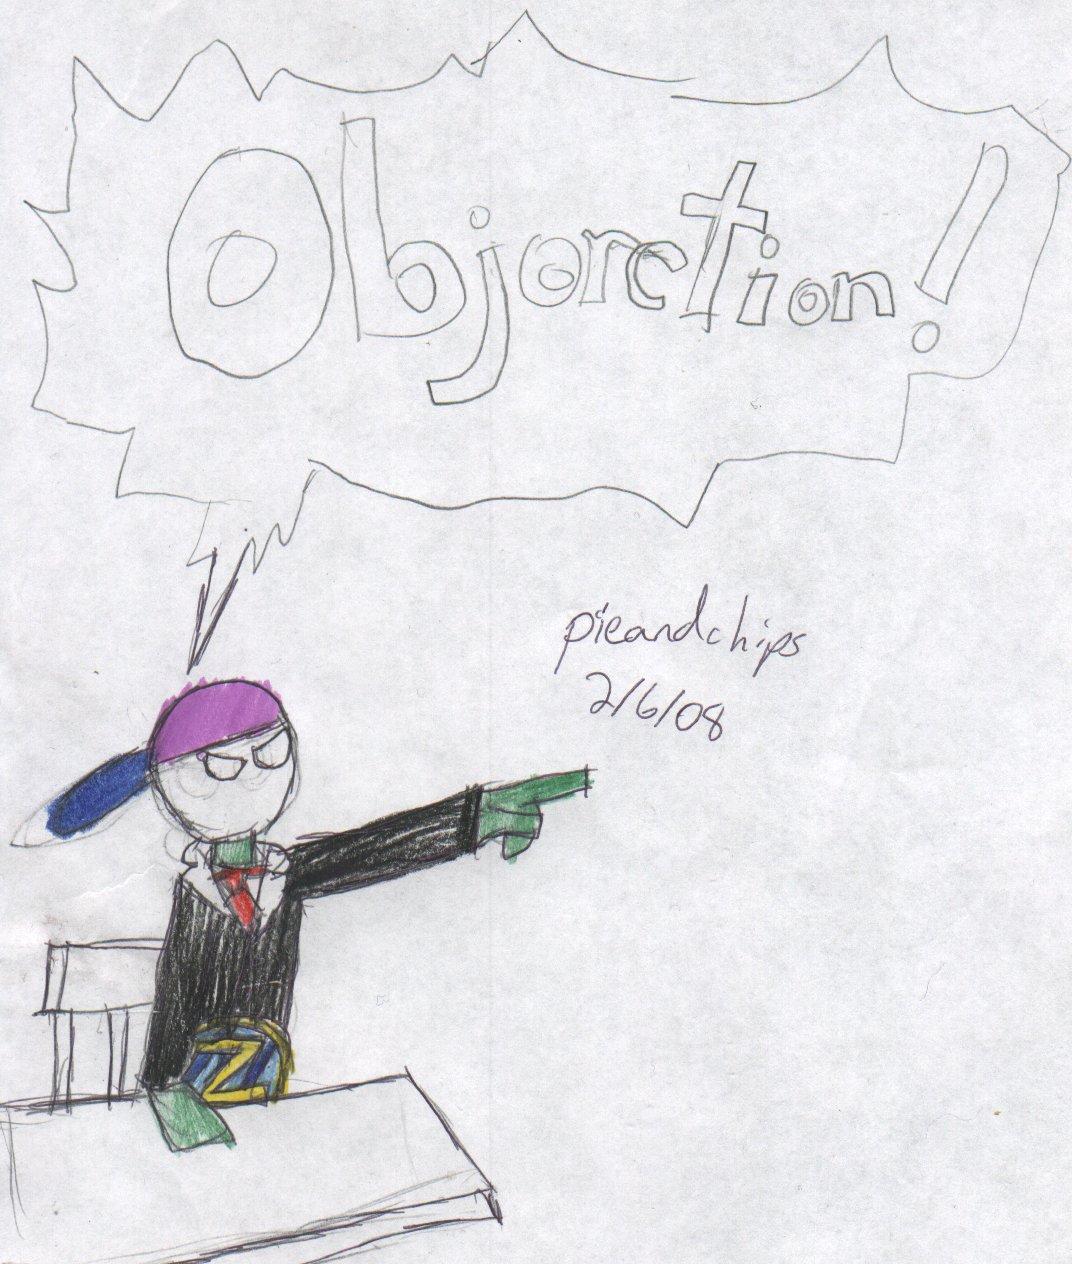 OBJORCTION!!! by pieandchips666